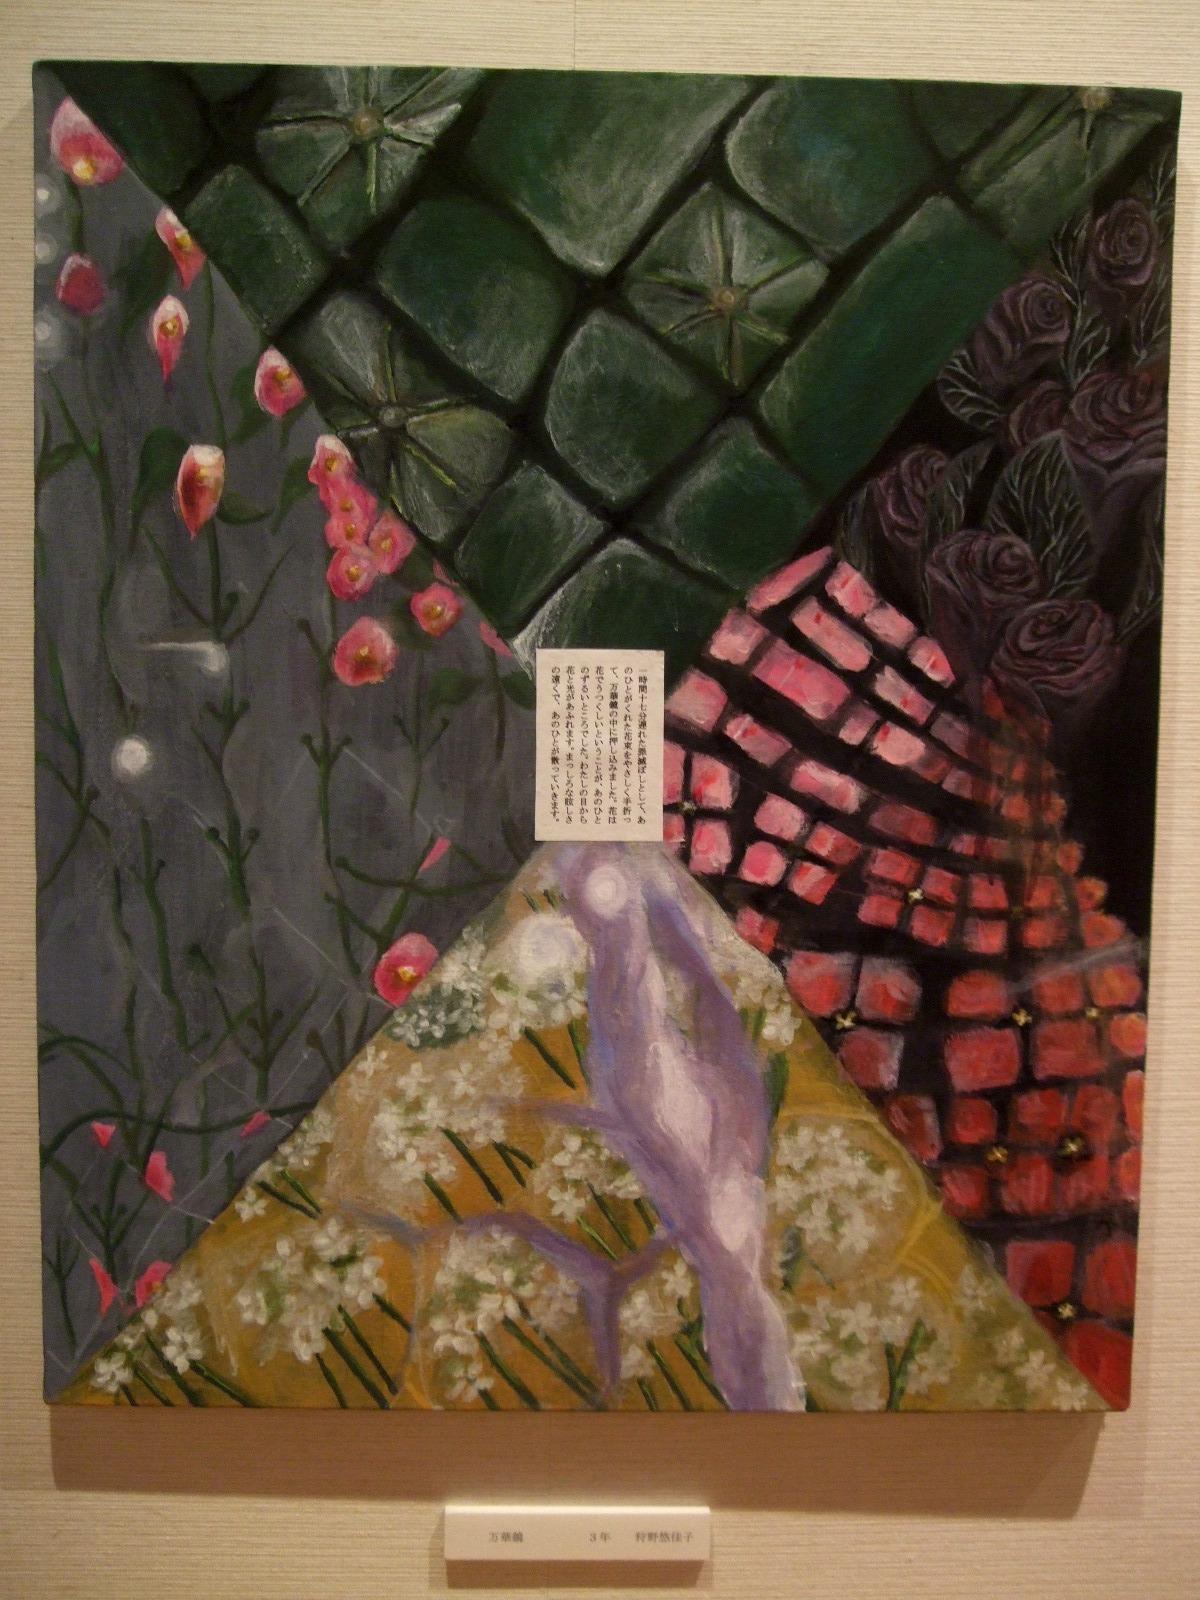 1357) 「狩野悠佳子の場合 ~旭丘高校OG」_f0126829_19353547.jpg